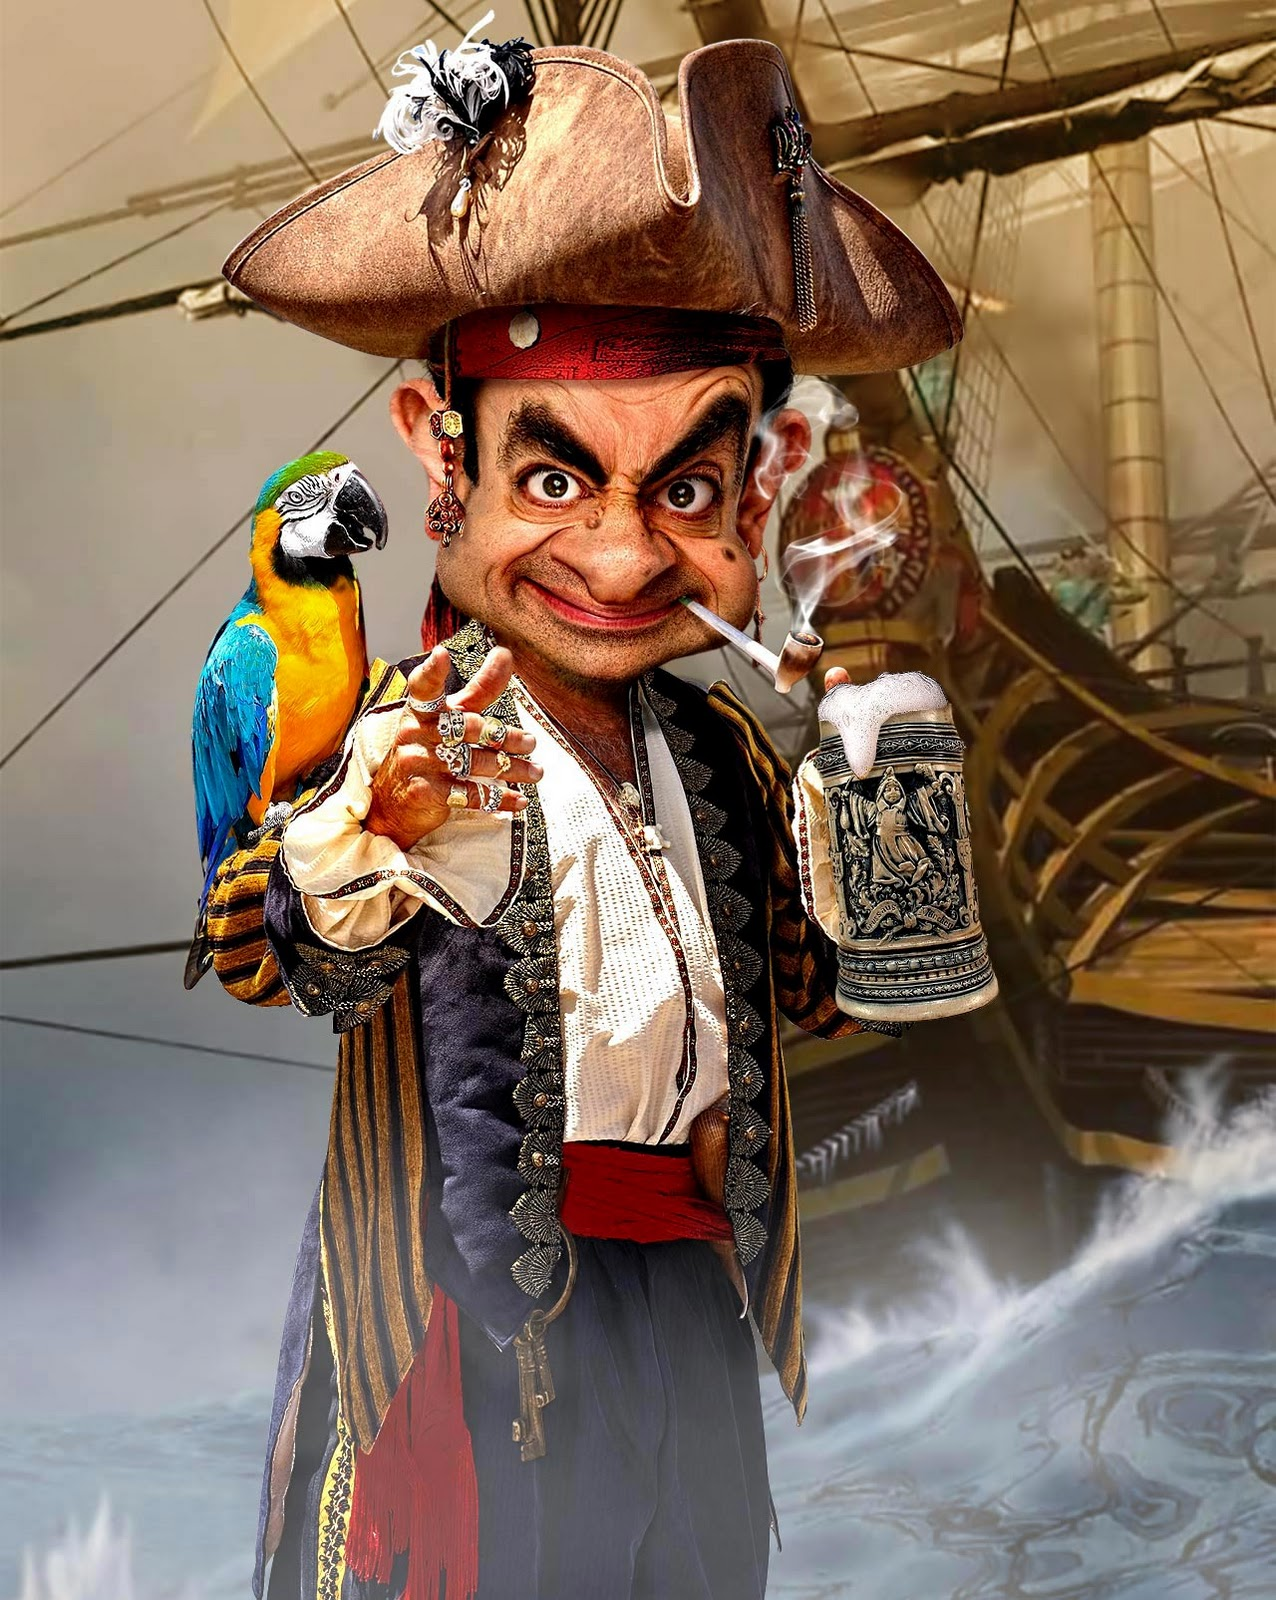 http://2.bp.blogspot.com/_sH-hM9UBdCg/TNIb7x2vK6I/AAAAAAAAAPU/M2Z6z_kPmQw/s1600/Pirate_Bean.jpg